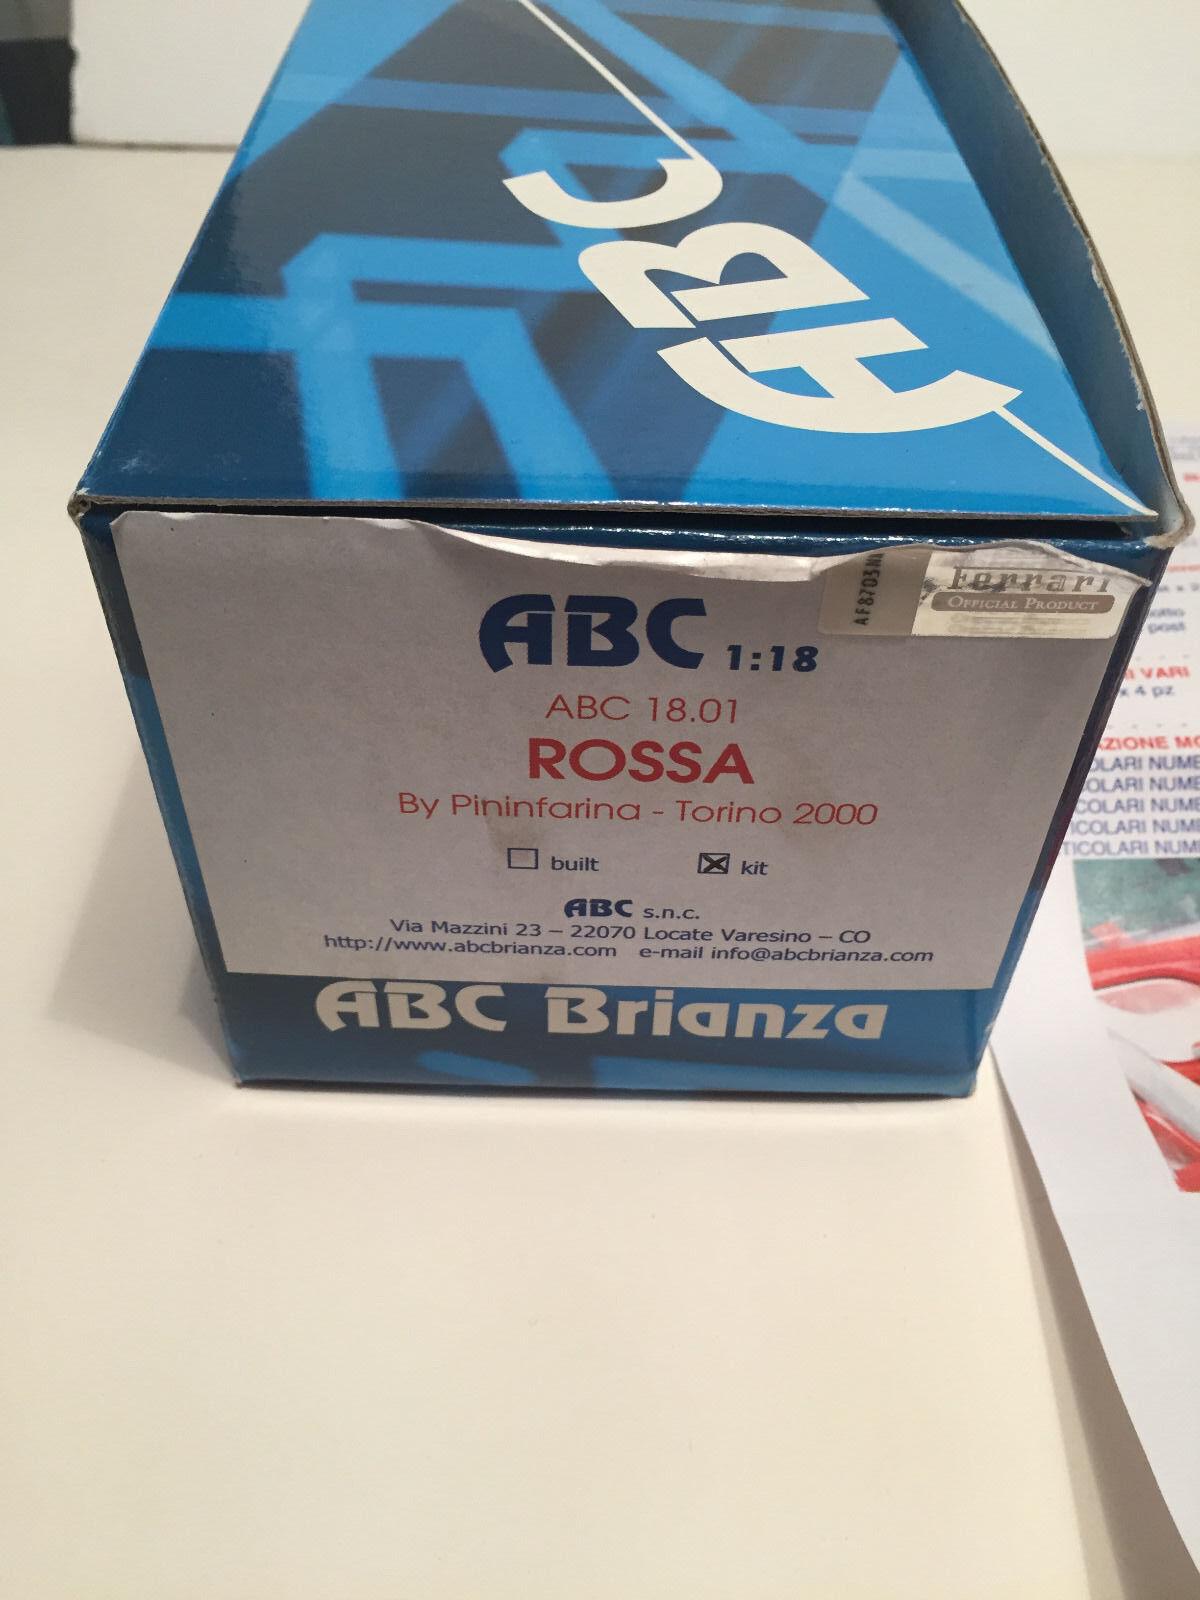 1 18 ABC Brianza ABC 18.01 Ferrari ROSSA By Pininfarina - Torino 2000 Kit